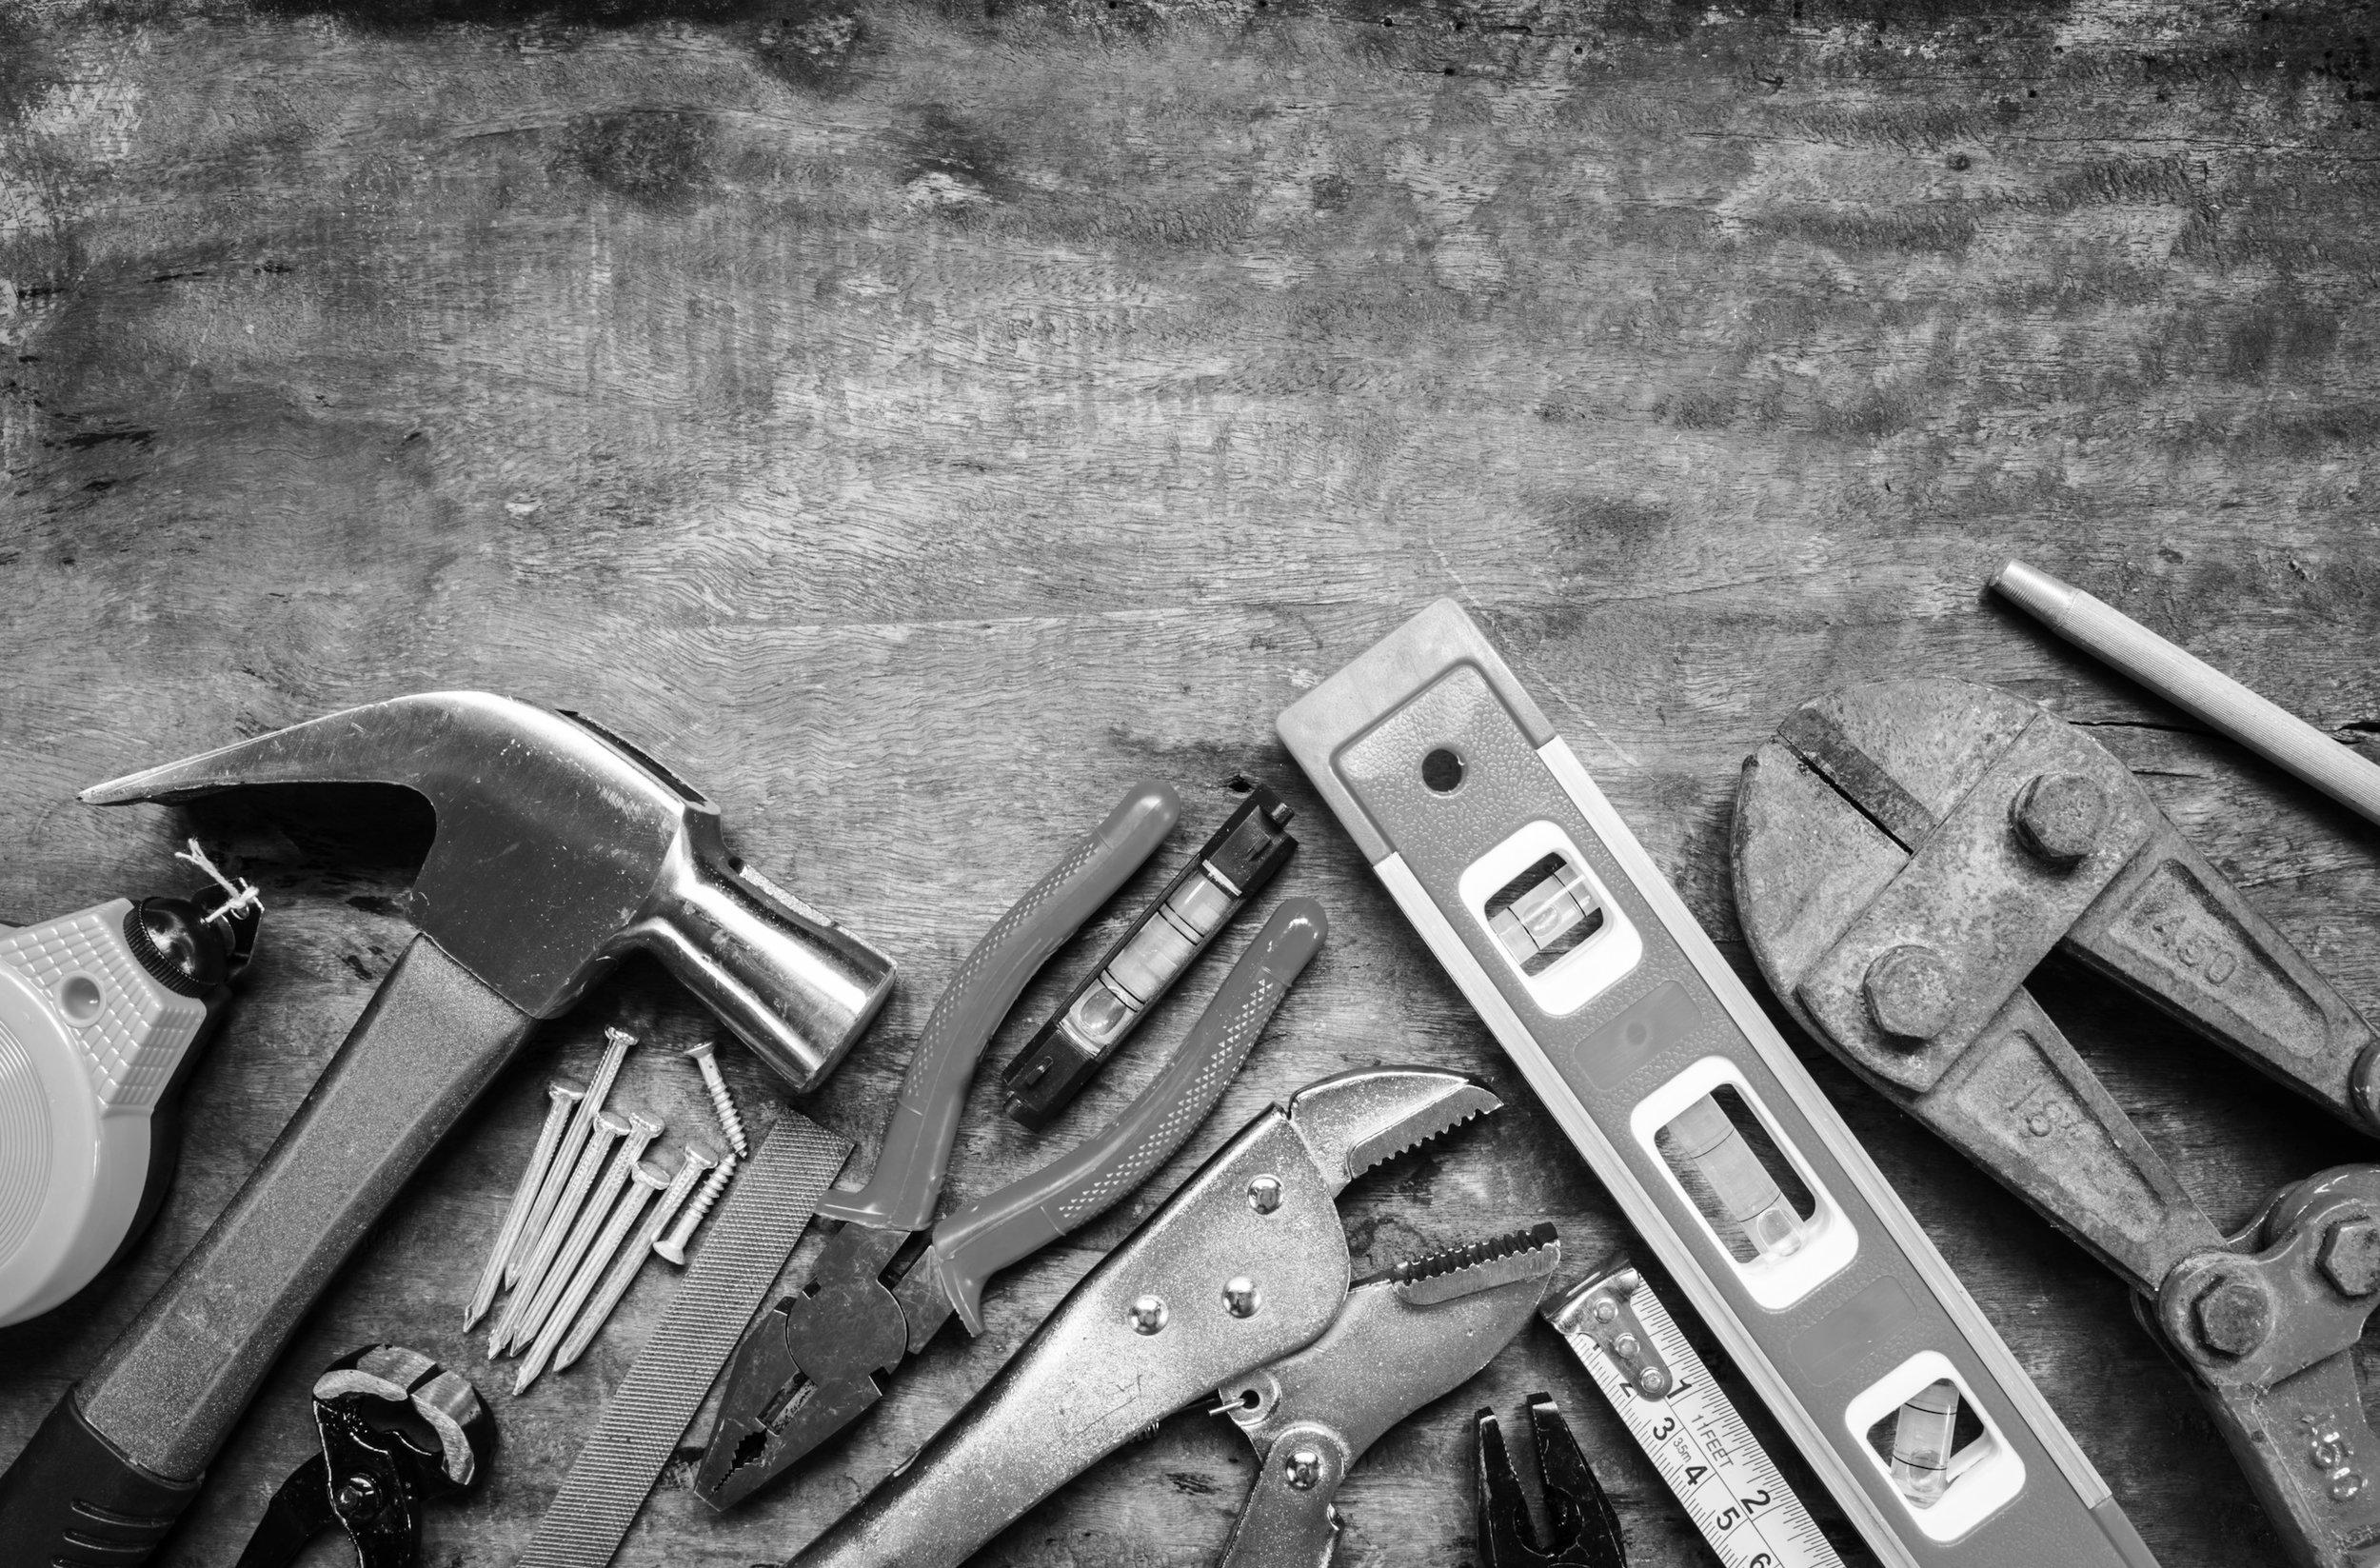 Home Repairs, Improvements, Remodeling in Arizona, Sahuarita, Green Valley, Tucson, Vail, Handyman.